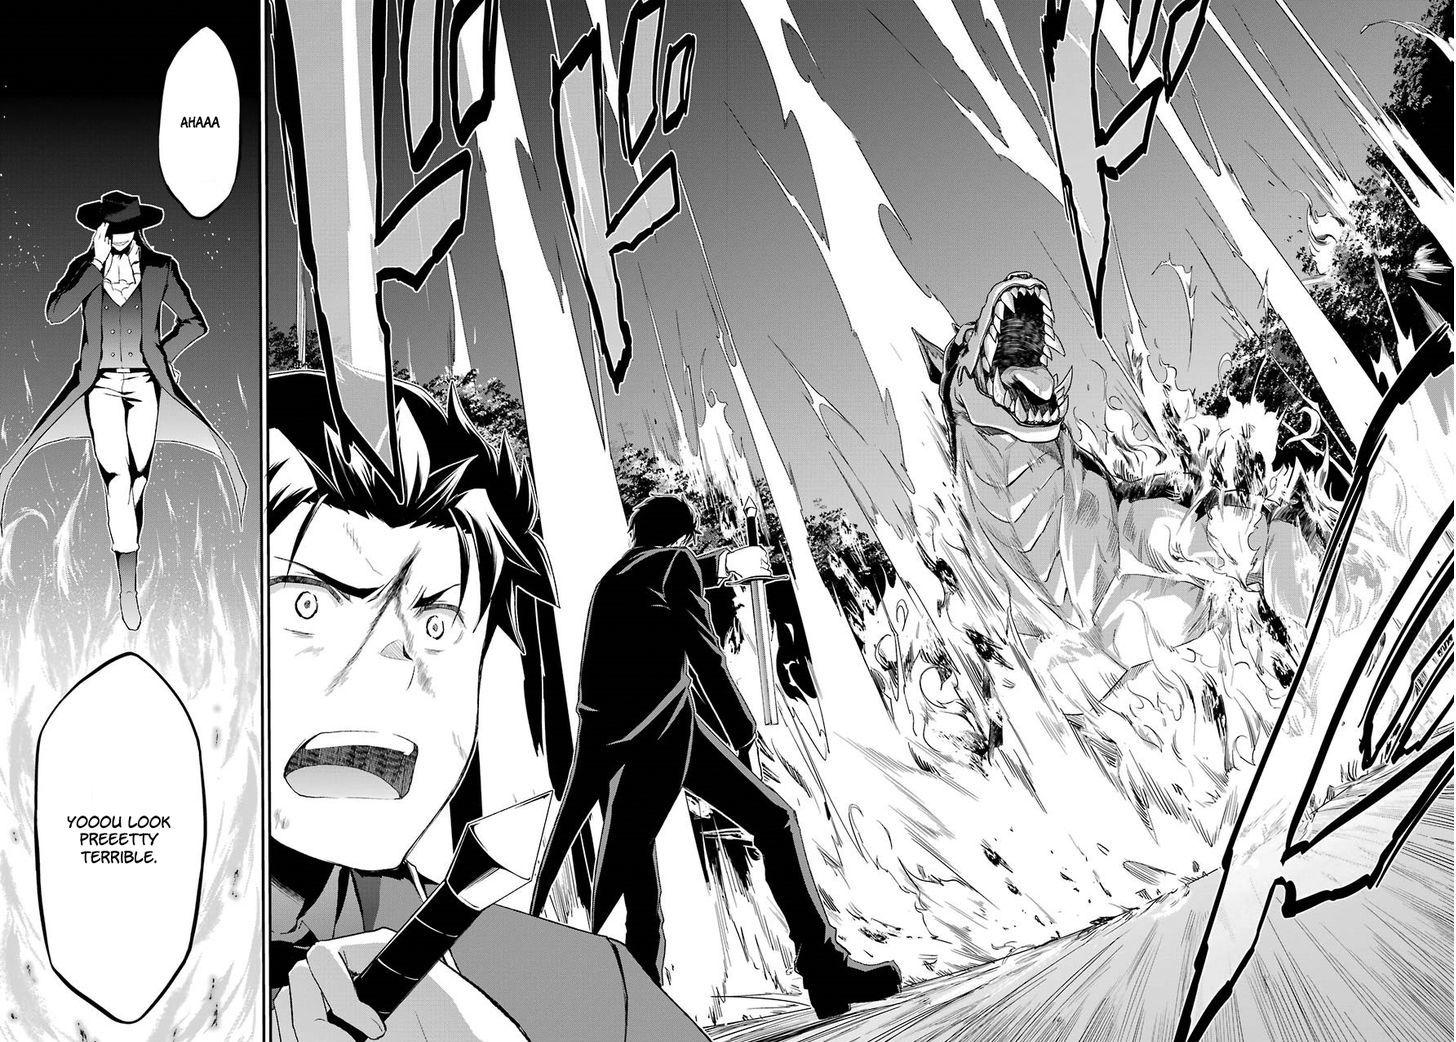 rezero manga, read rezero manga, rezero episodes, rezero characters, rezero anime season 2, rezero rem, rezero ova, rezero dub, re:zero frozen bonds full movie, re:zero season 2 opening, re:zero life in another world season 2, re:zero ova download, re:zero memory snow, re:zero netflix, re:zero director's cut ep 1, re:zero episode 3 english dub, re:zero gogoanime, re:zero episodes dubbed, re:zero funimation, re:zero age rating, re:zero review, re:zero character, yusuke kobayashi, re:zero kara hajimeru isekai seikatsu ep 1, re:zero episodes, re:zero ln, emilia zero kara, natsuki subaru quotes, rem death re:zero, wiki re zero satella, shinichirou otsuka, re:zero spoilers 2019, re:zero chapter 21, re:zero volume 9, watch re:zero season 2, re:zero ep 2 english dub, re:zero ep 19 eng sub, watch re:zero movie, where to watch re:zero memory snow, re:zero english dub part 2, rezero, rezero kara hajimeru isekai seikatsu manga, rezero wiki